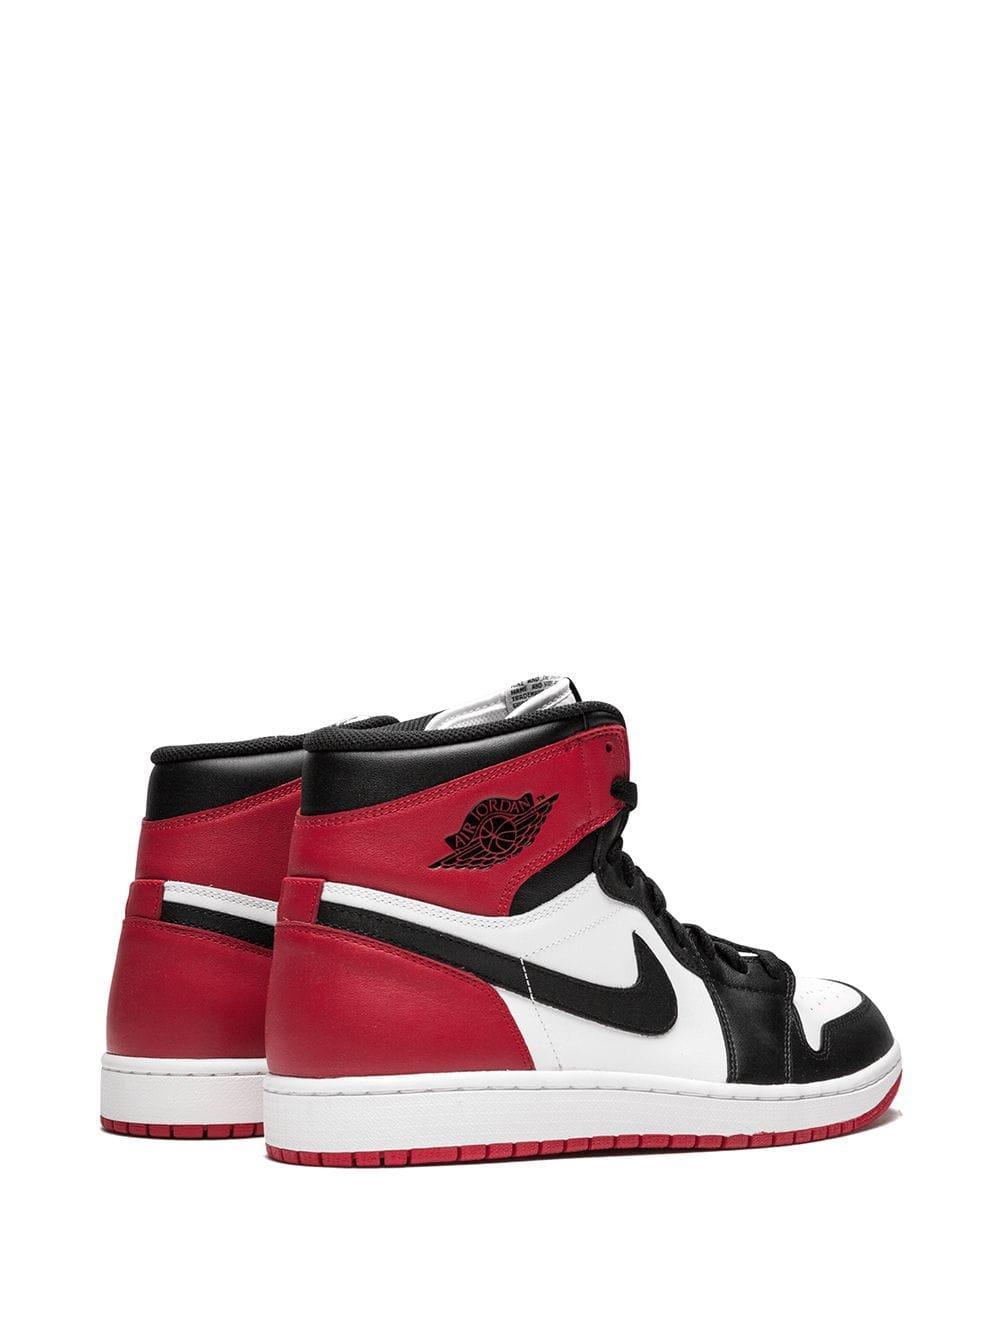 Nike Air 1 Retro High-top Sneakers voor heren